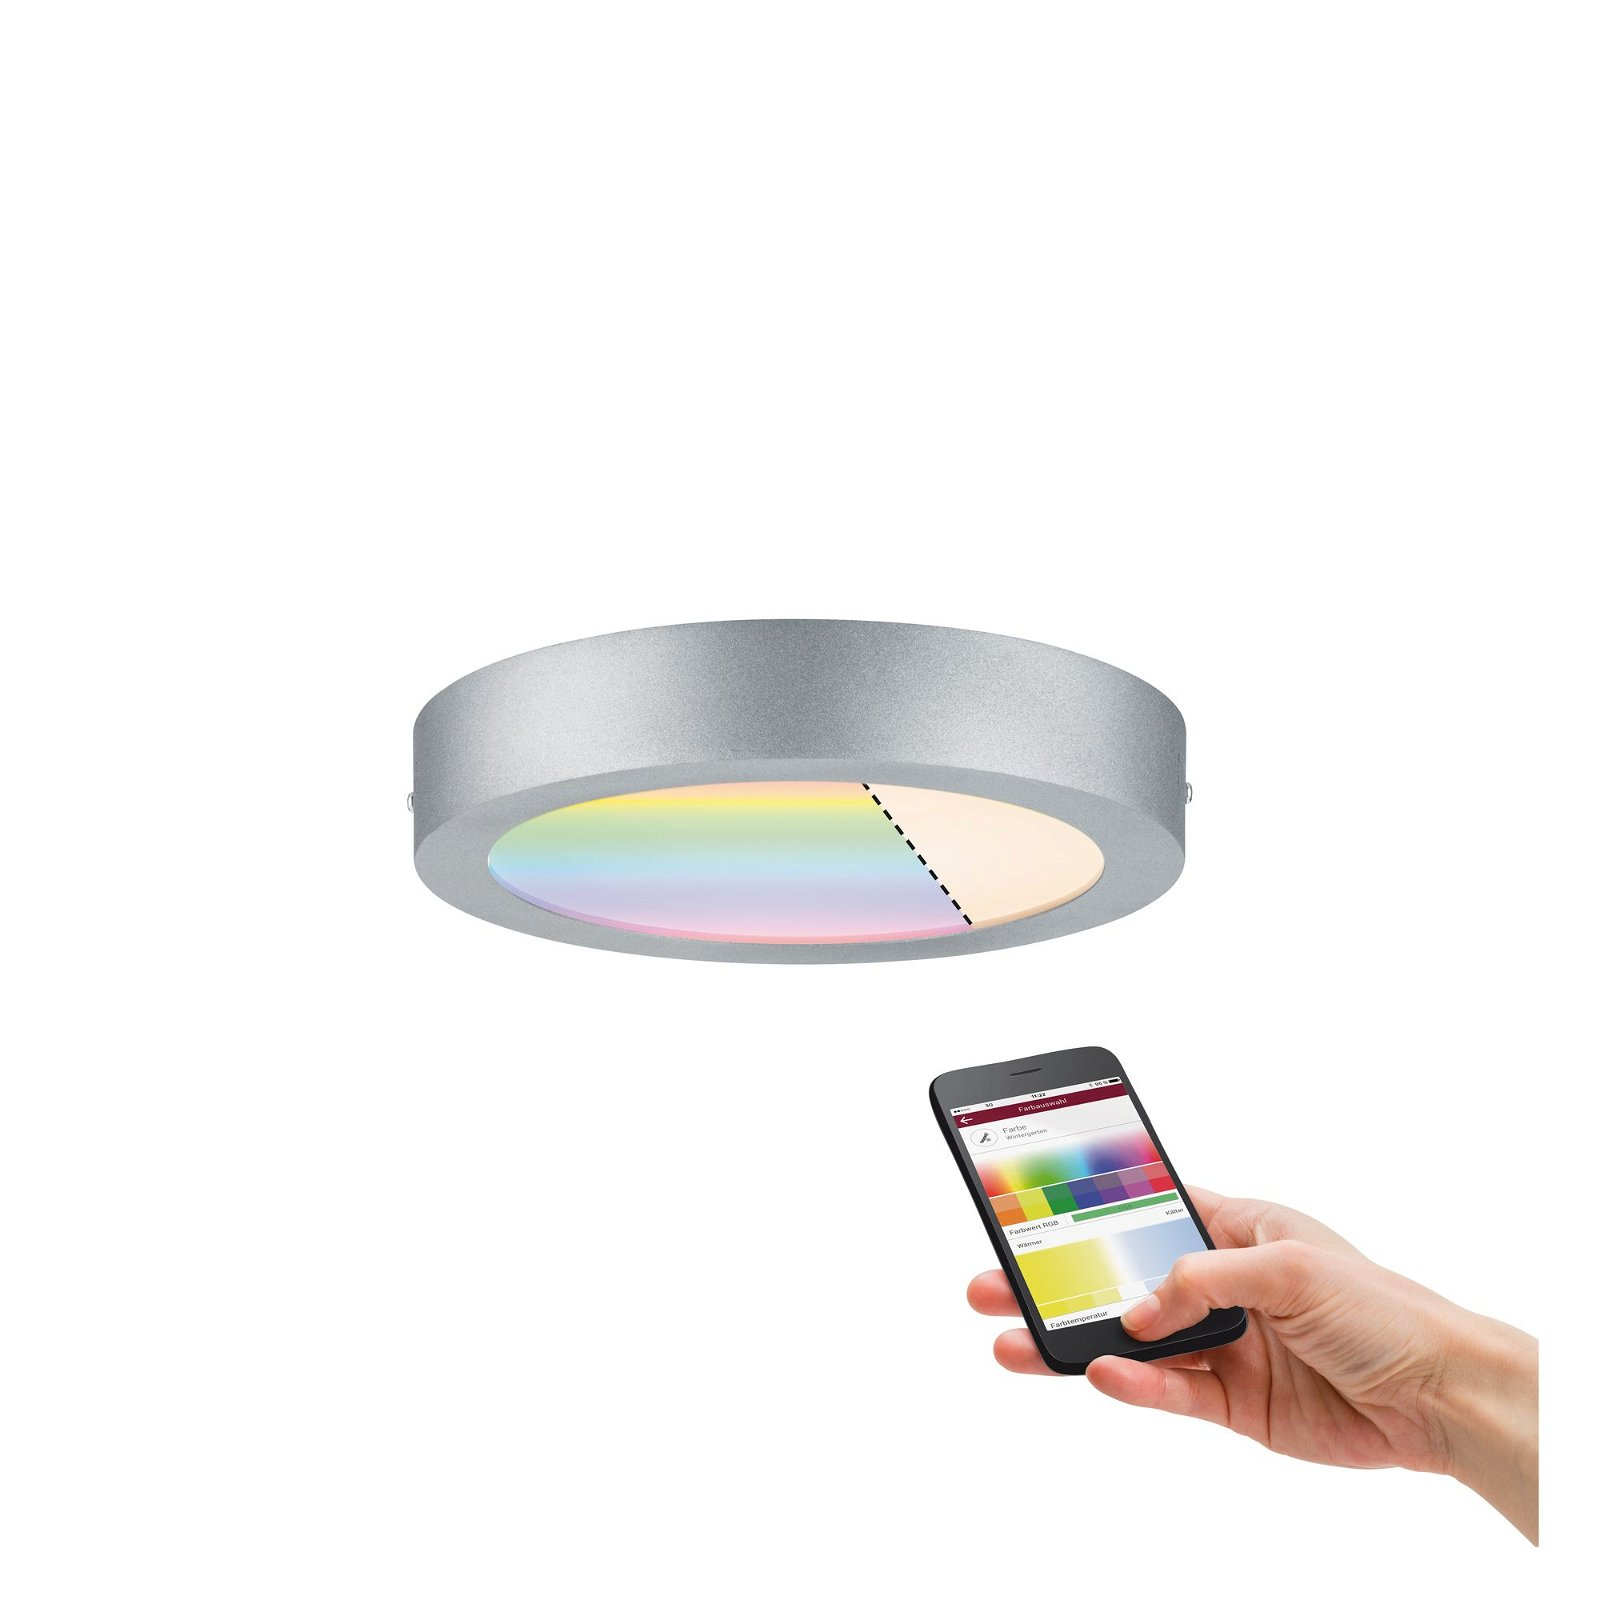 LED Panel Smart Home Zigbee Cesena rund 225mm 790lm RGBW Chrom matt